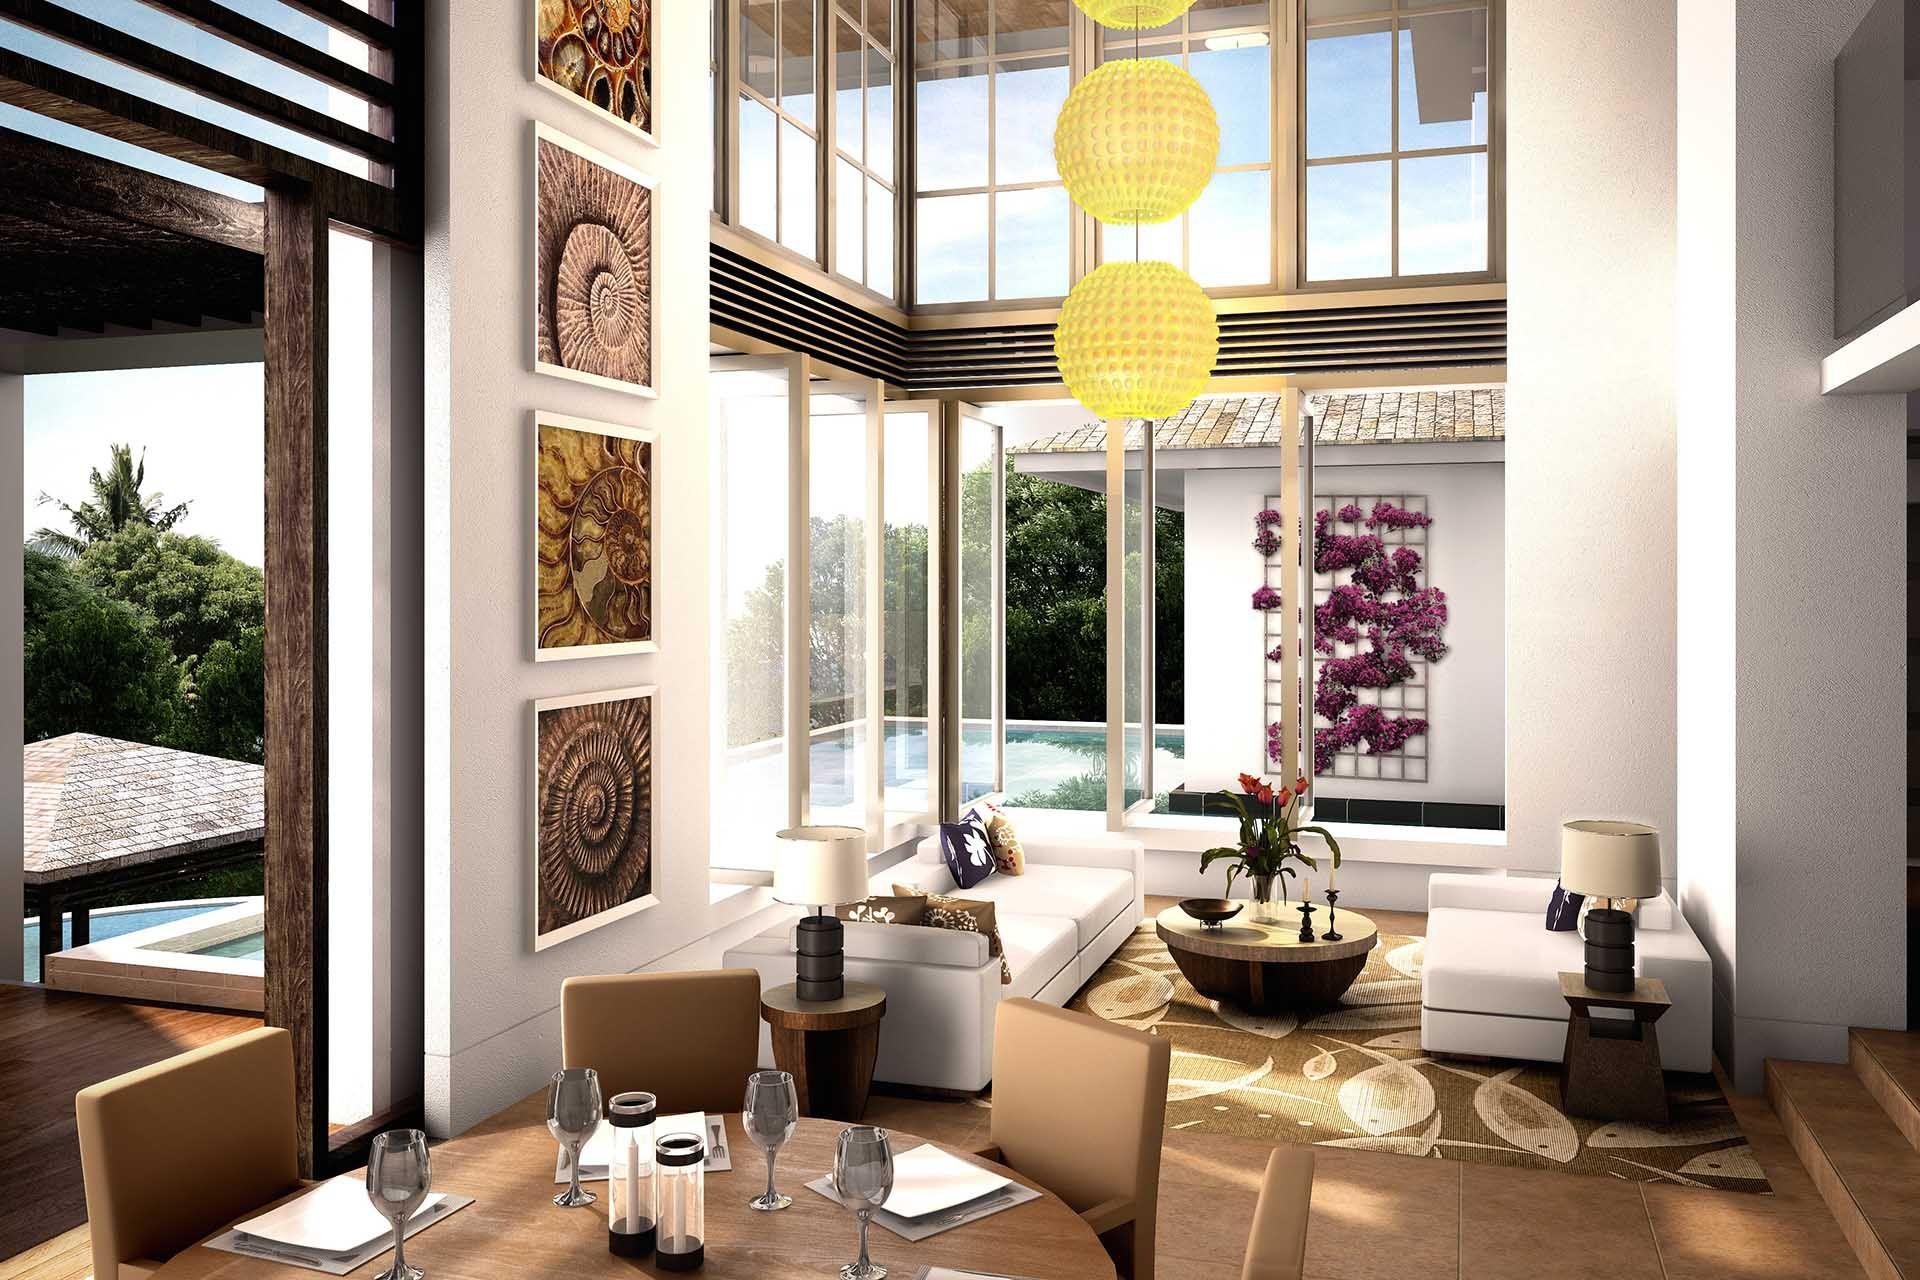 Le Petit Trou Interior Designers Wimberly Interiors watmore